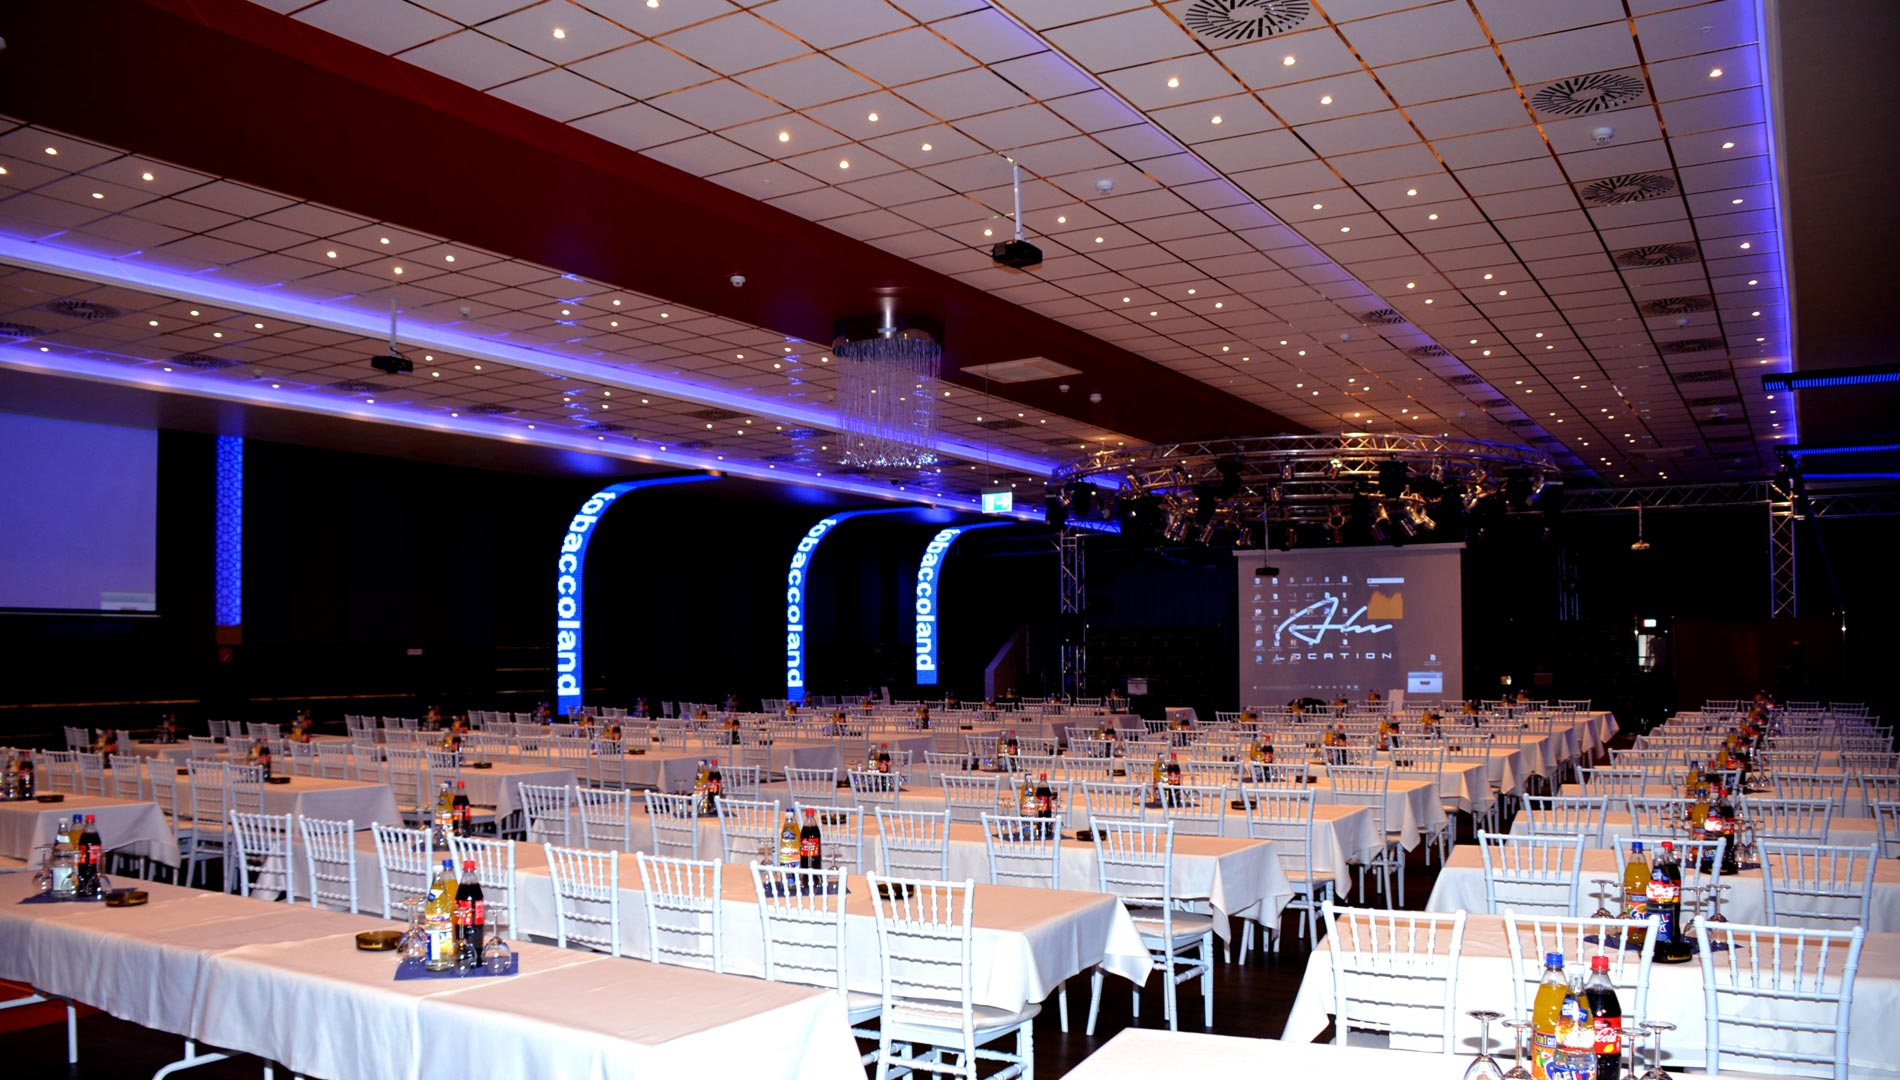 Walima Festsaal Hochzeitssaal In Worrstadt Youtube